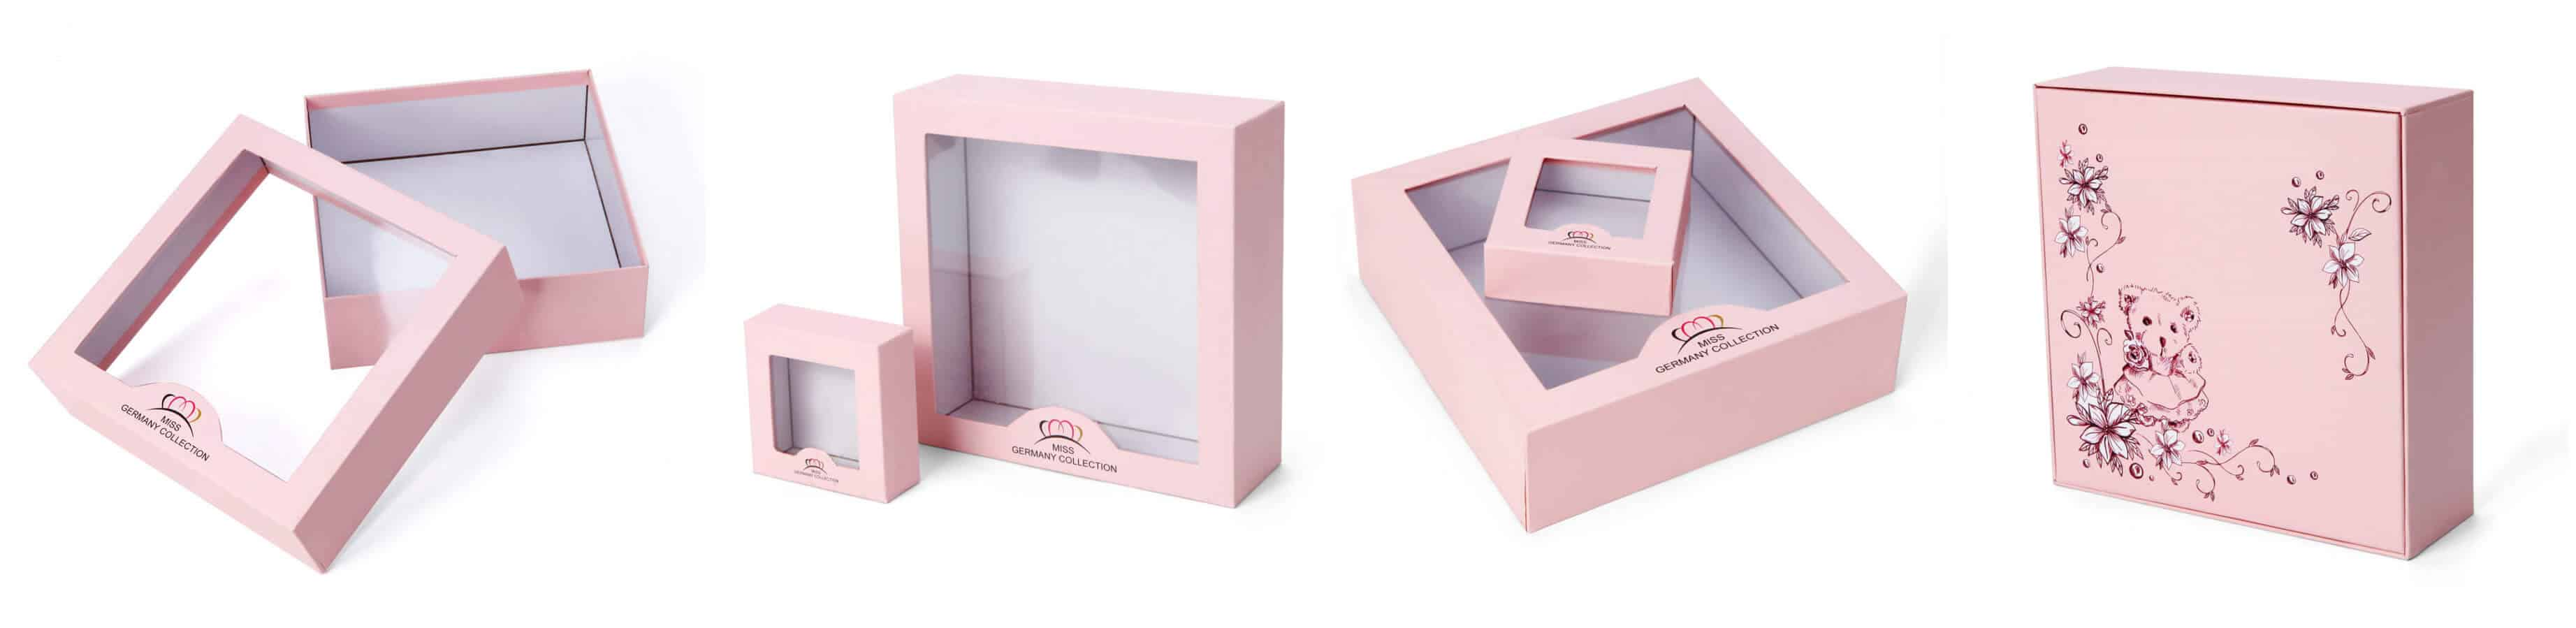 Custom-Rigid-Window-Boxes-b